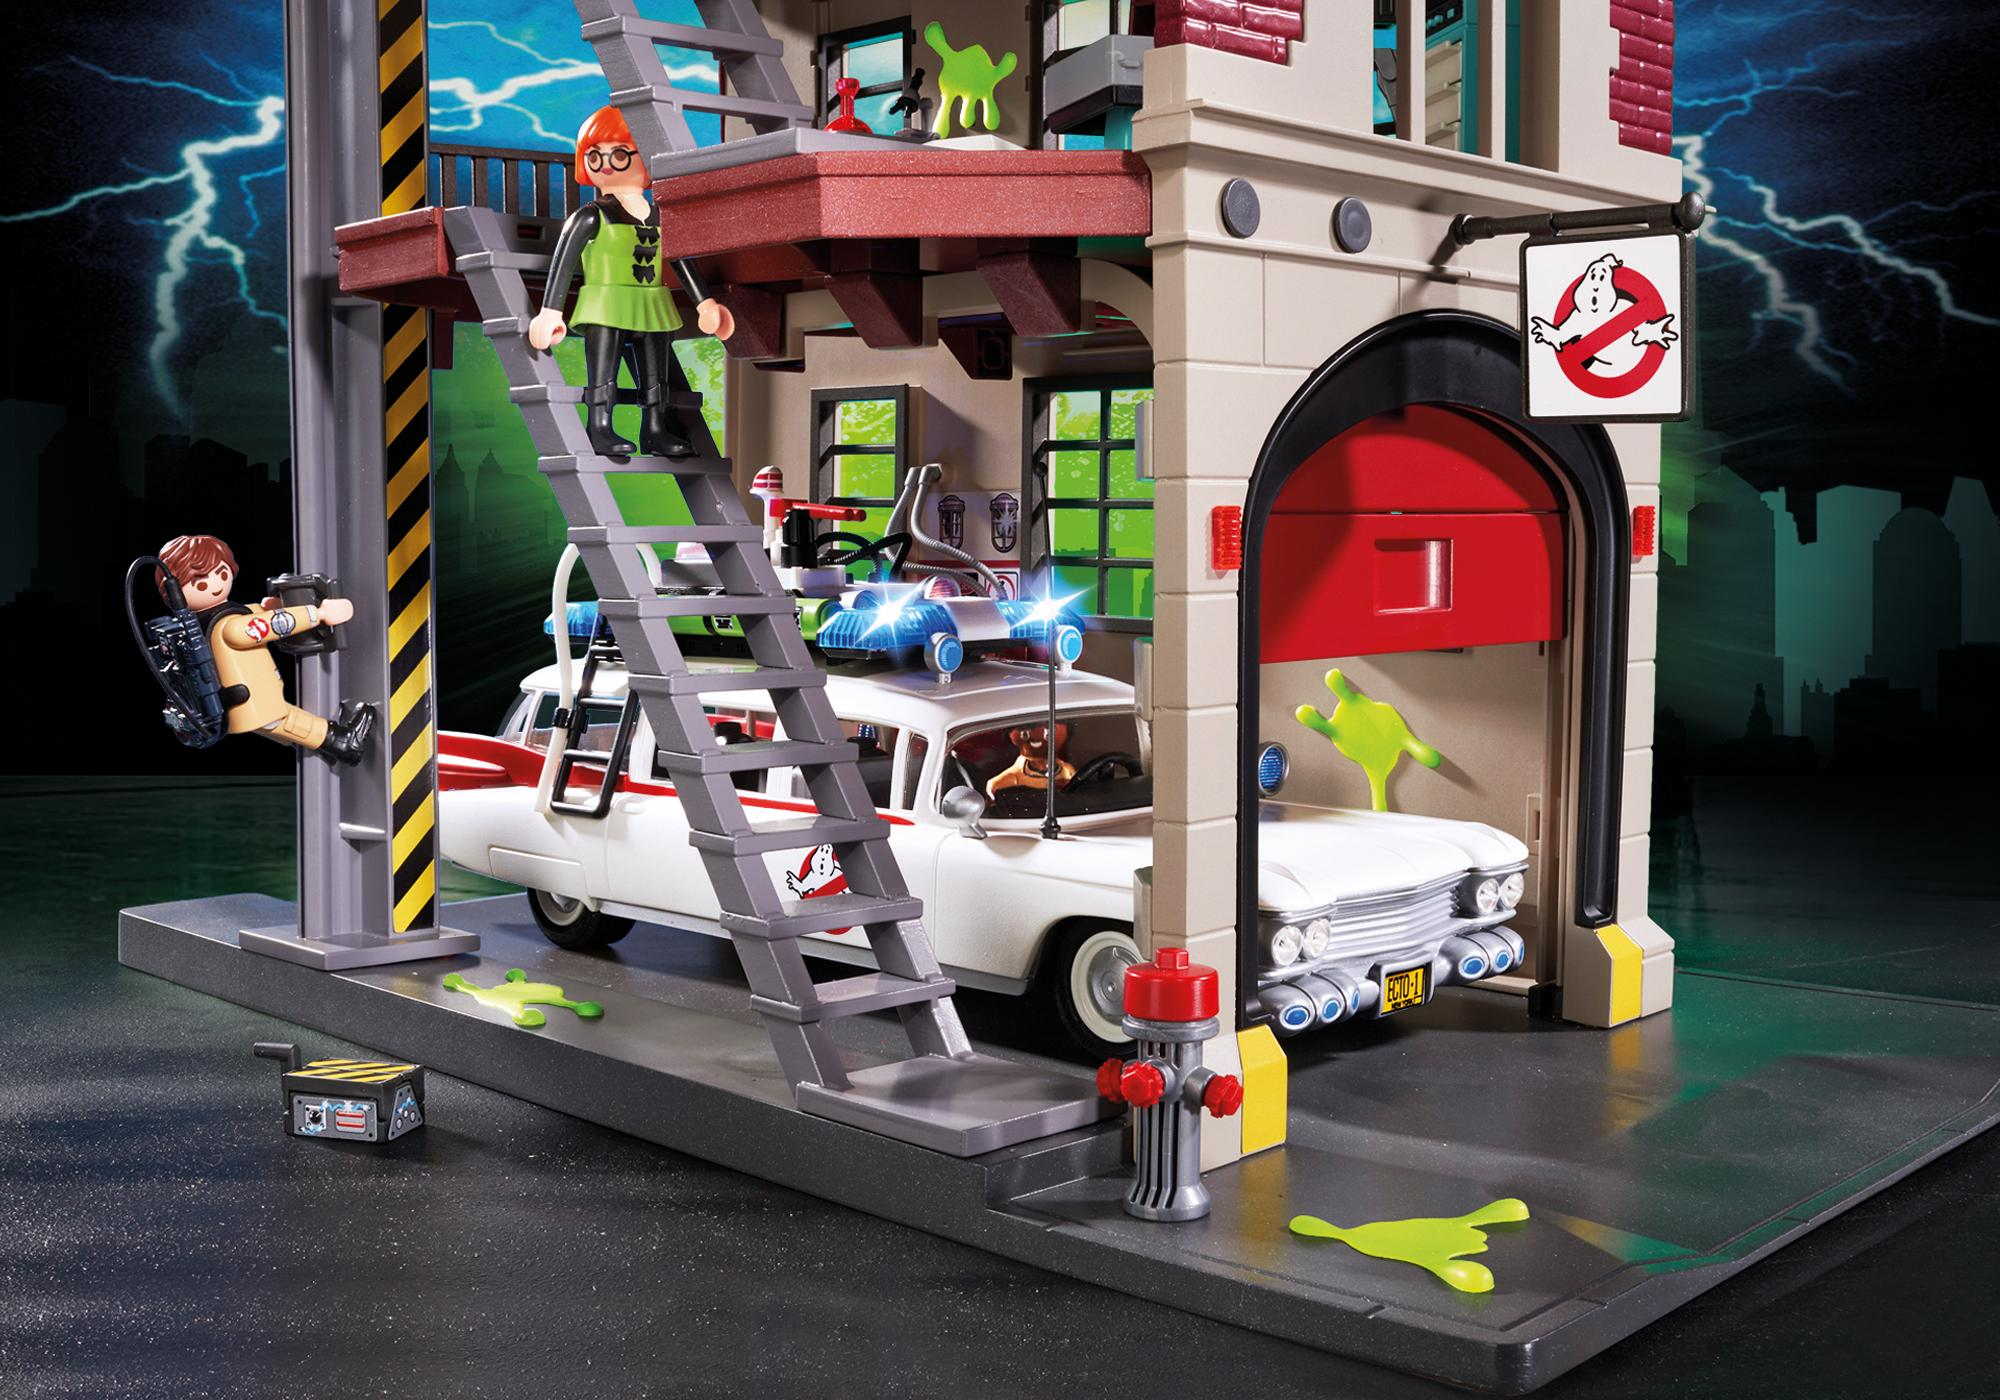 http://media.playmobil.com/i/playmobil/9220_product_extra1/Ecto-1 Ghostbusters